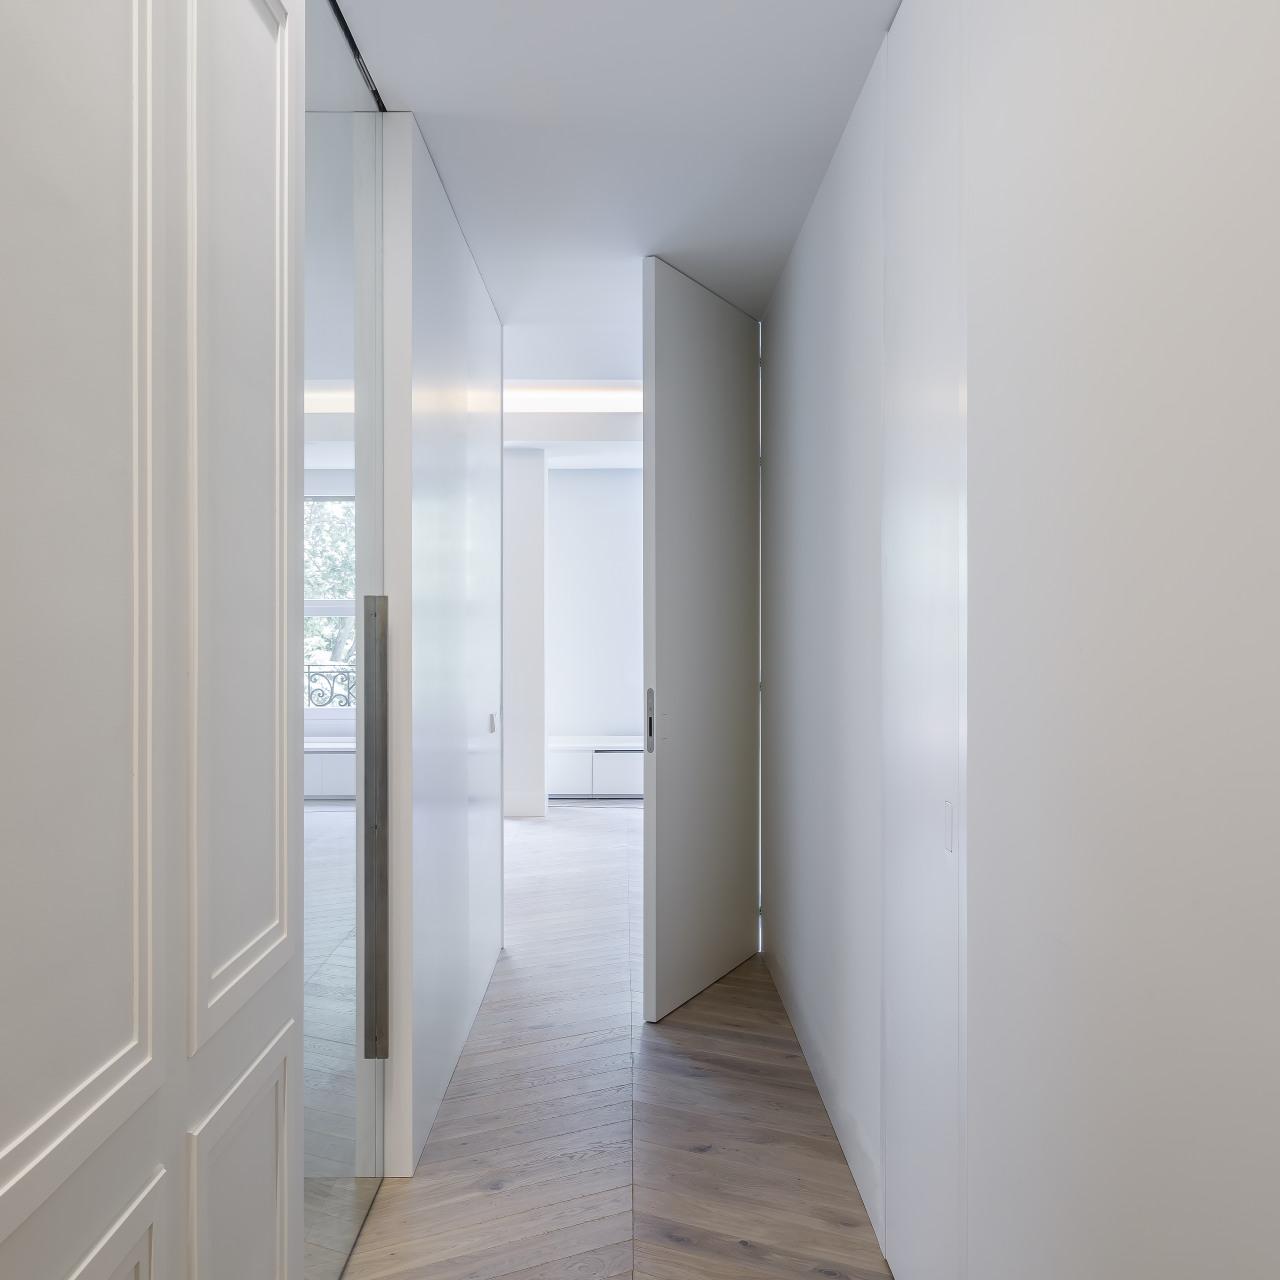 fotografia-arquitectura-valencia-german-cabo-gallardo-llopis-bfm-edificatoria-turia01 (14)